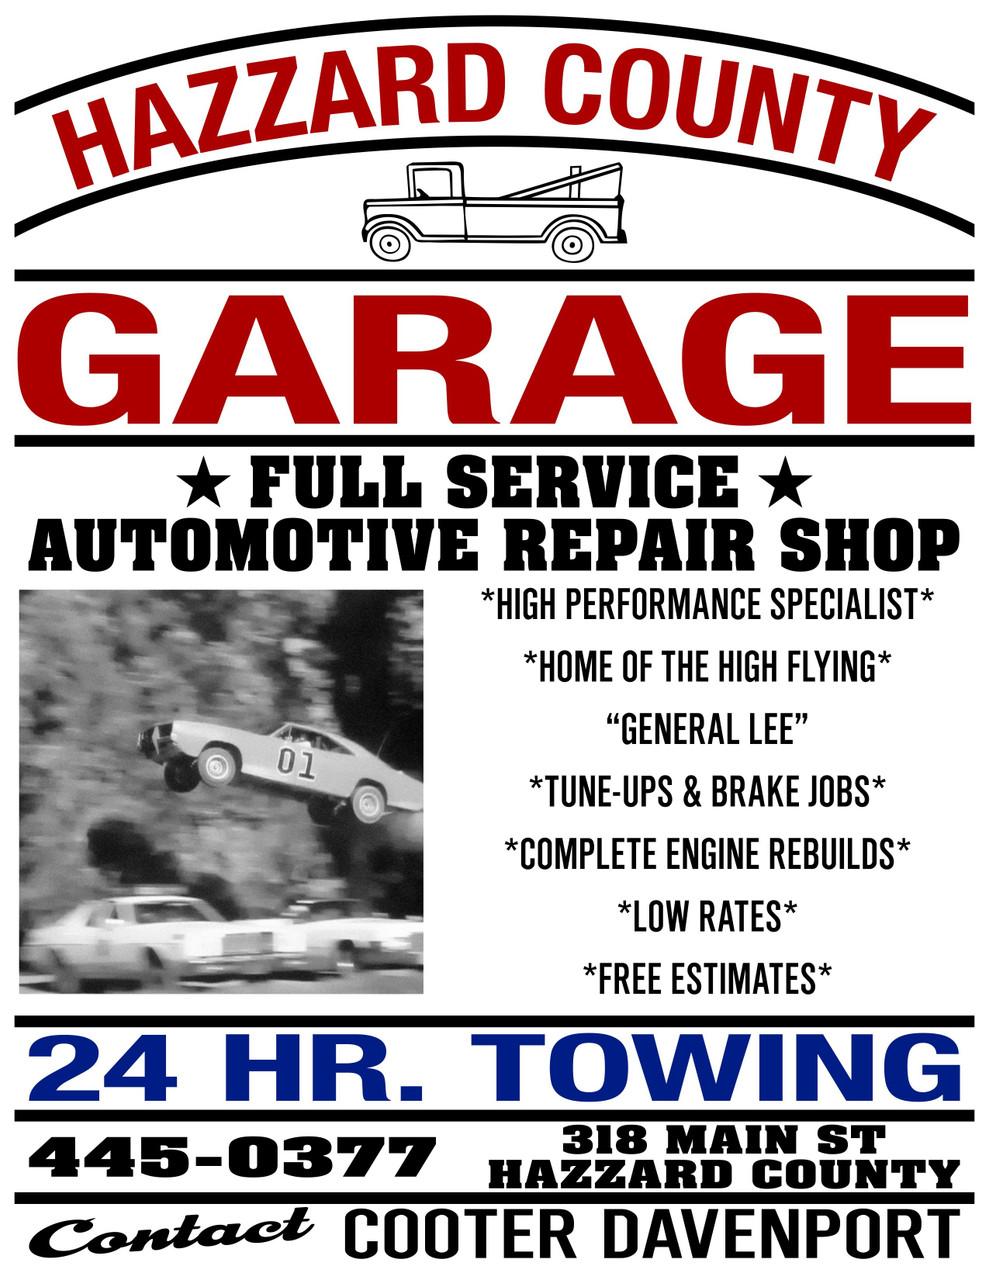 Hazzard County Garage Service & Repair Print (22x17)